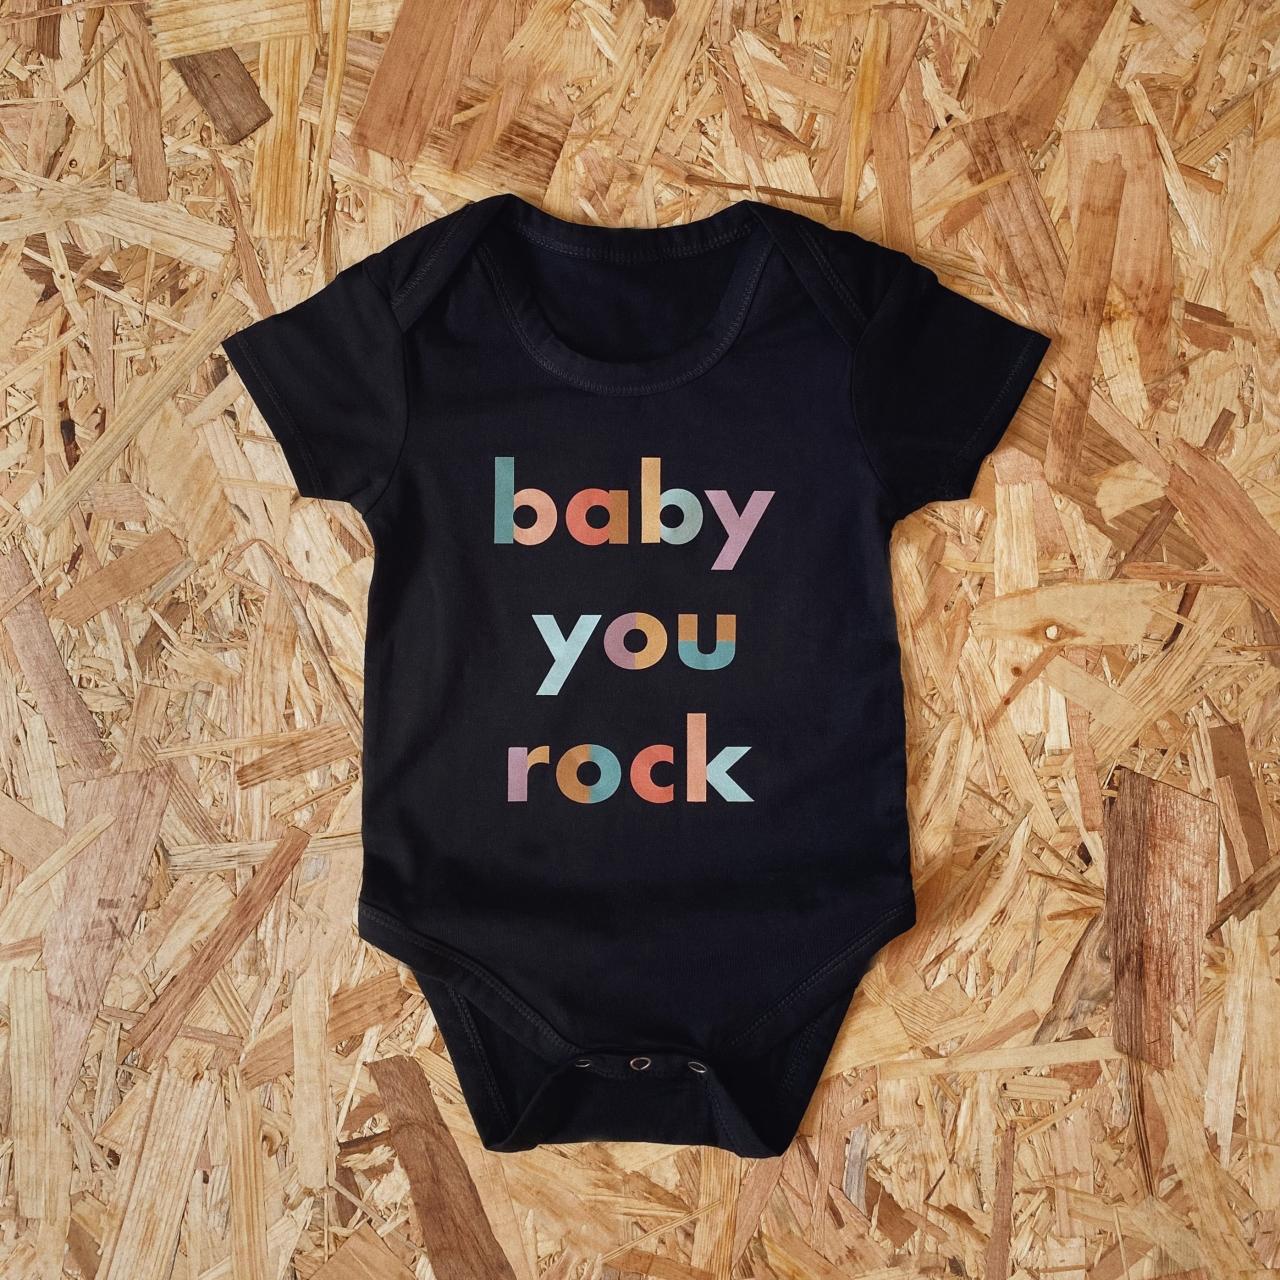 Body baby you rock